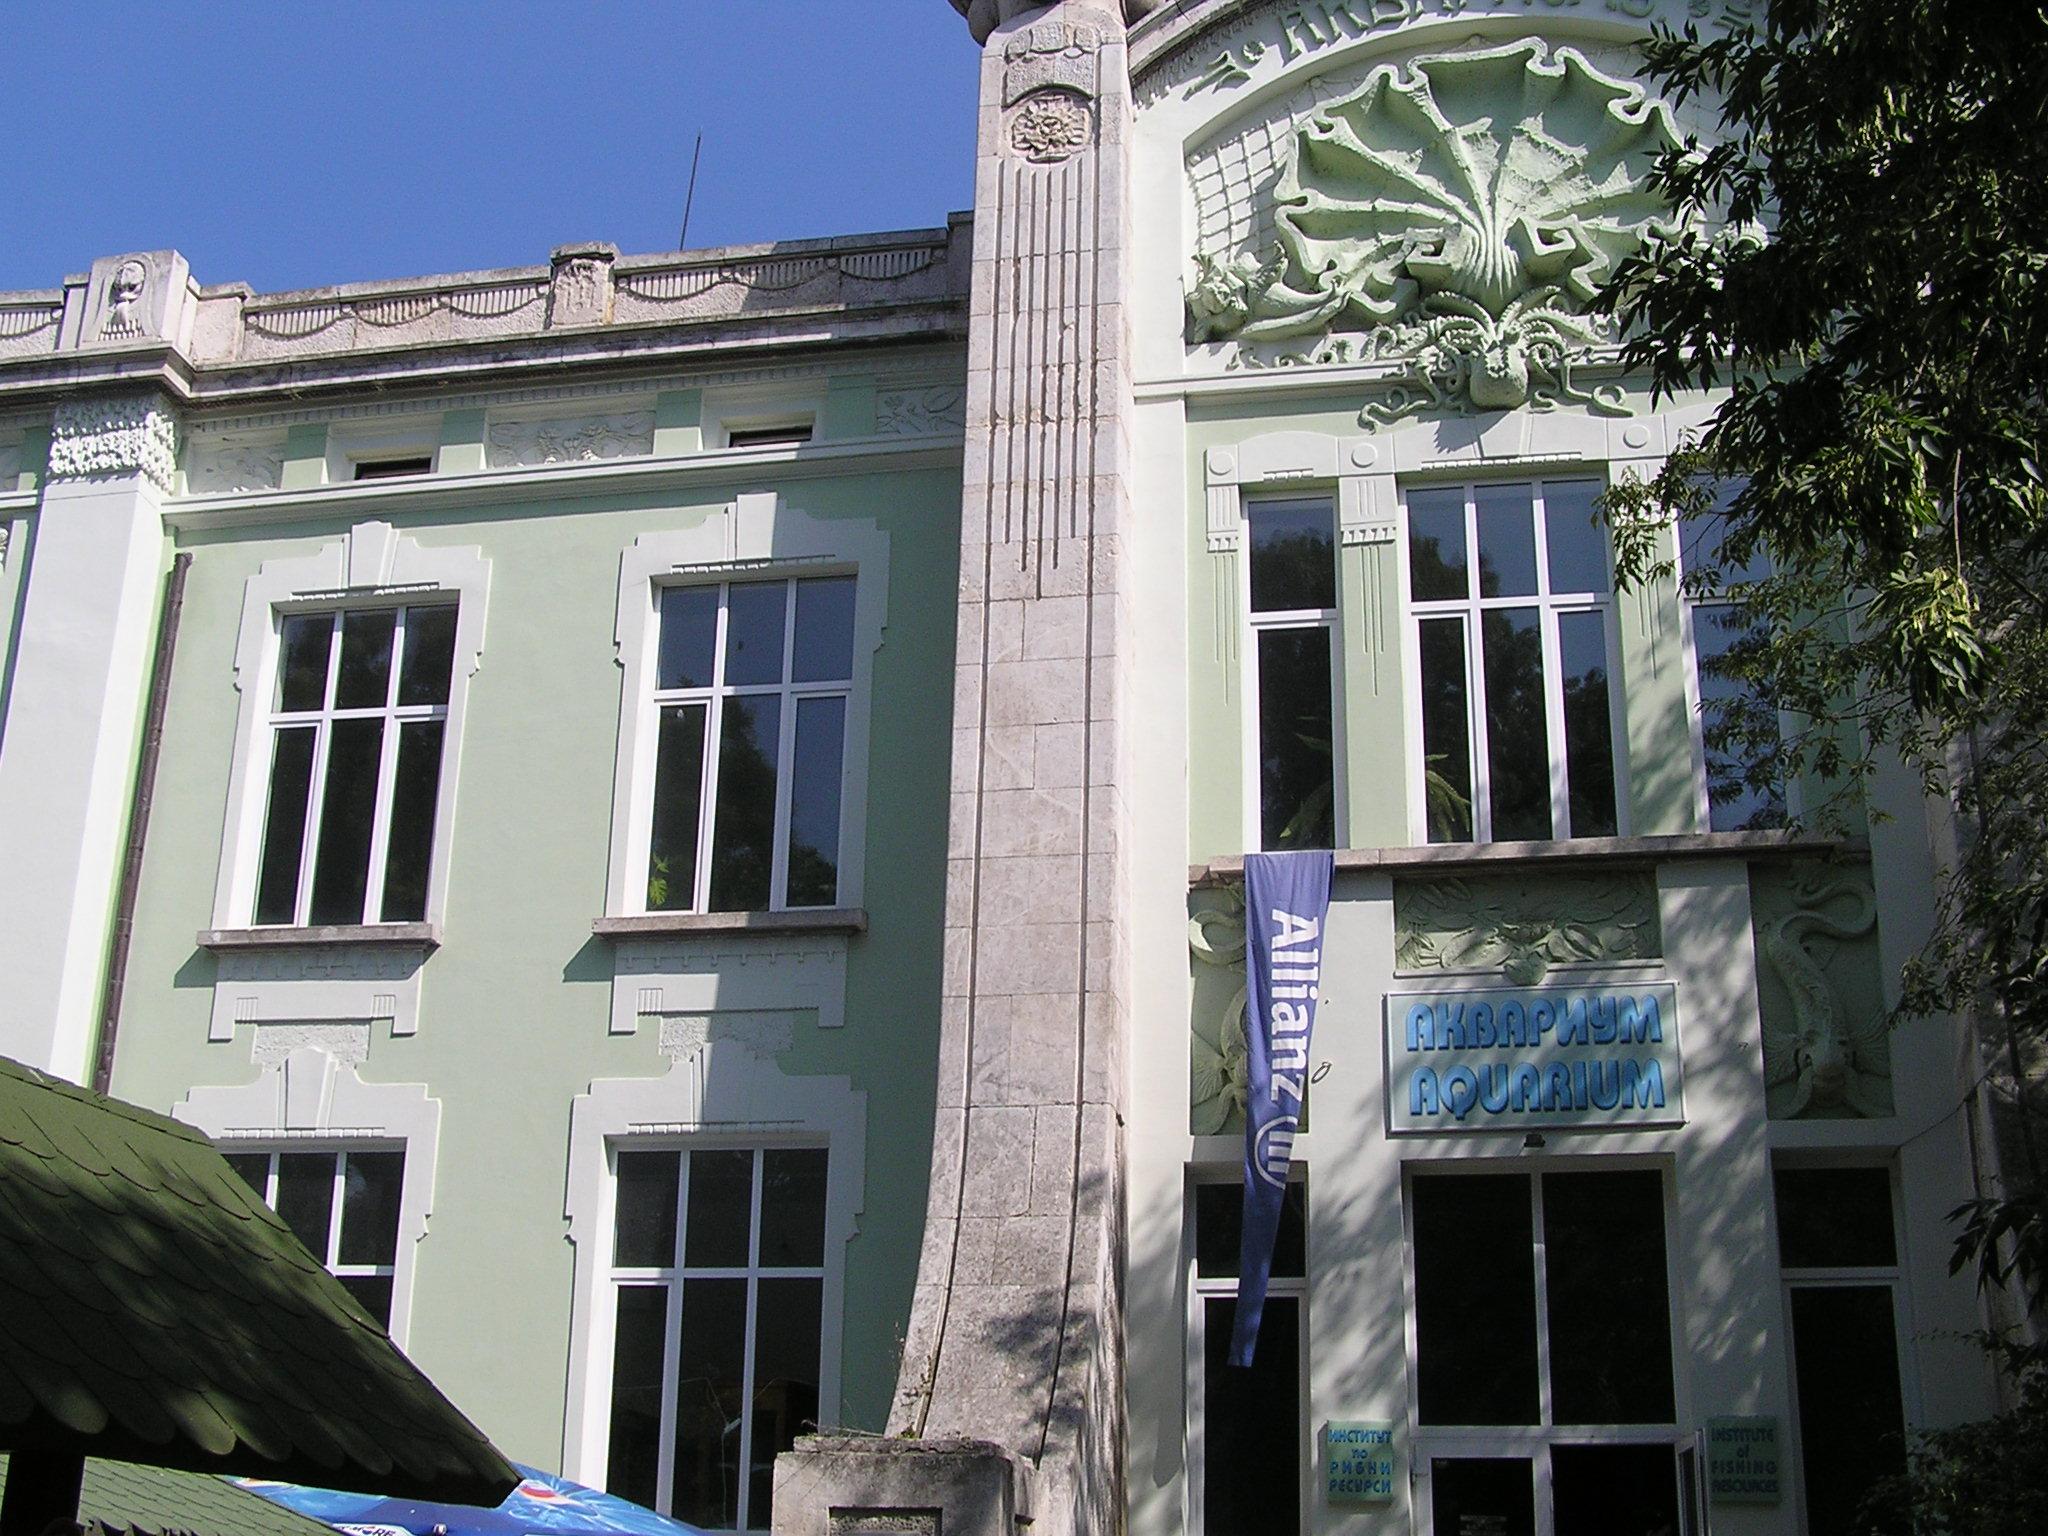 File:Aquarium Varna, Bulgaria.JPG - Wikipedia, the free encyclopedia